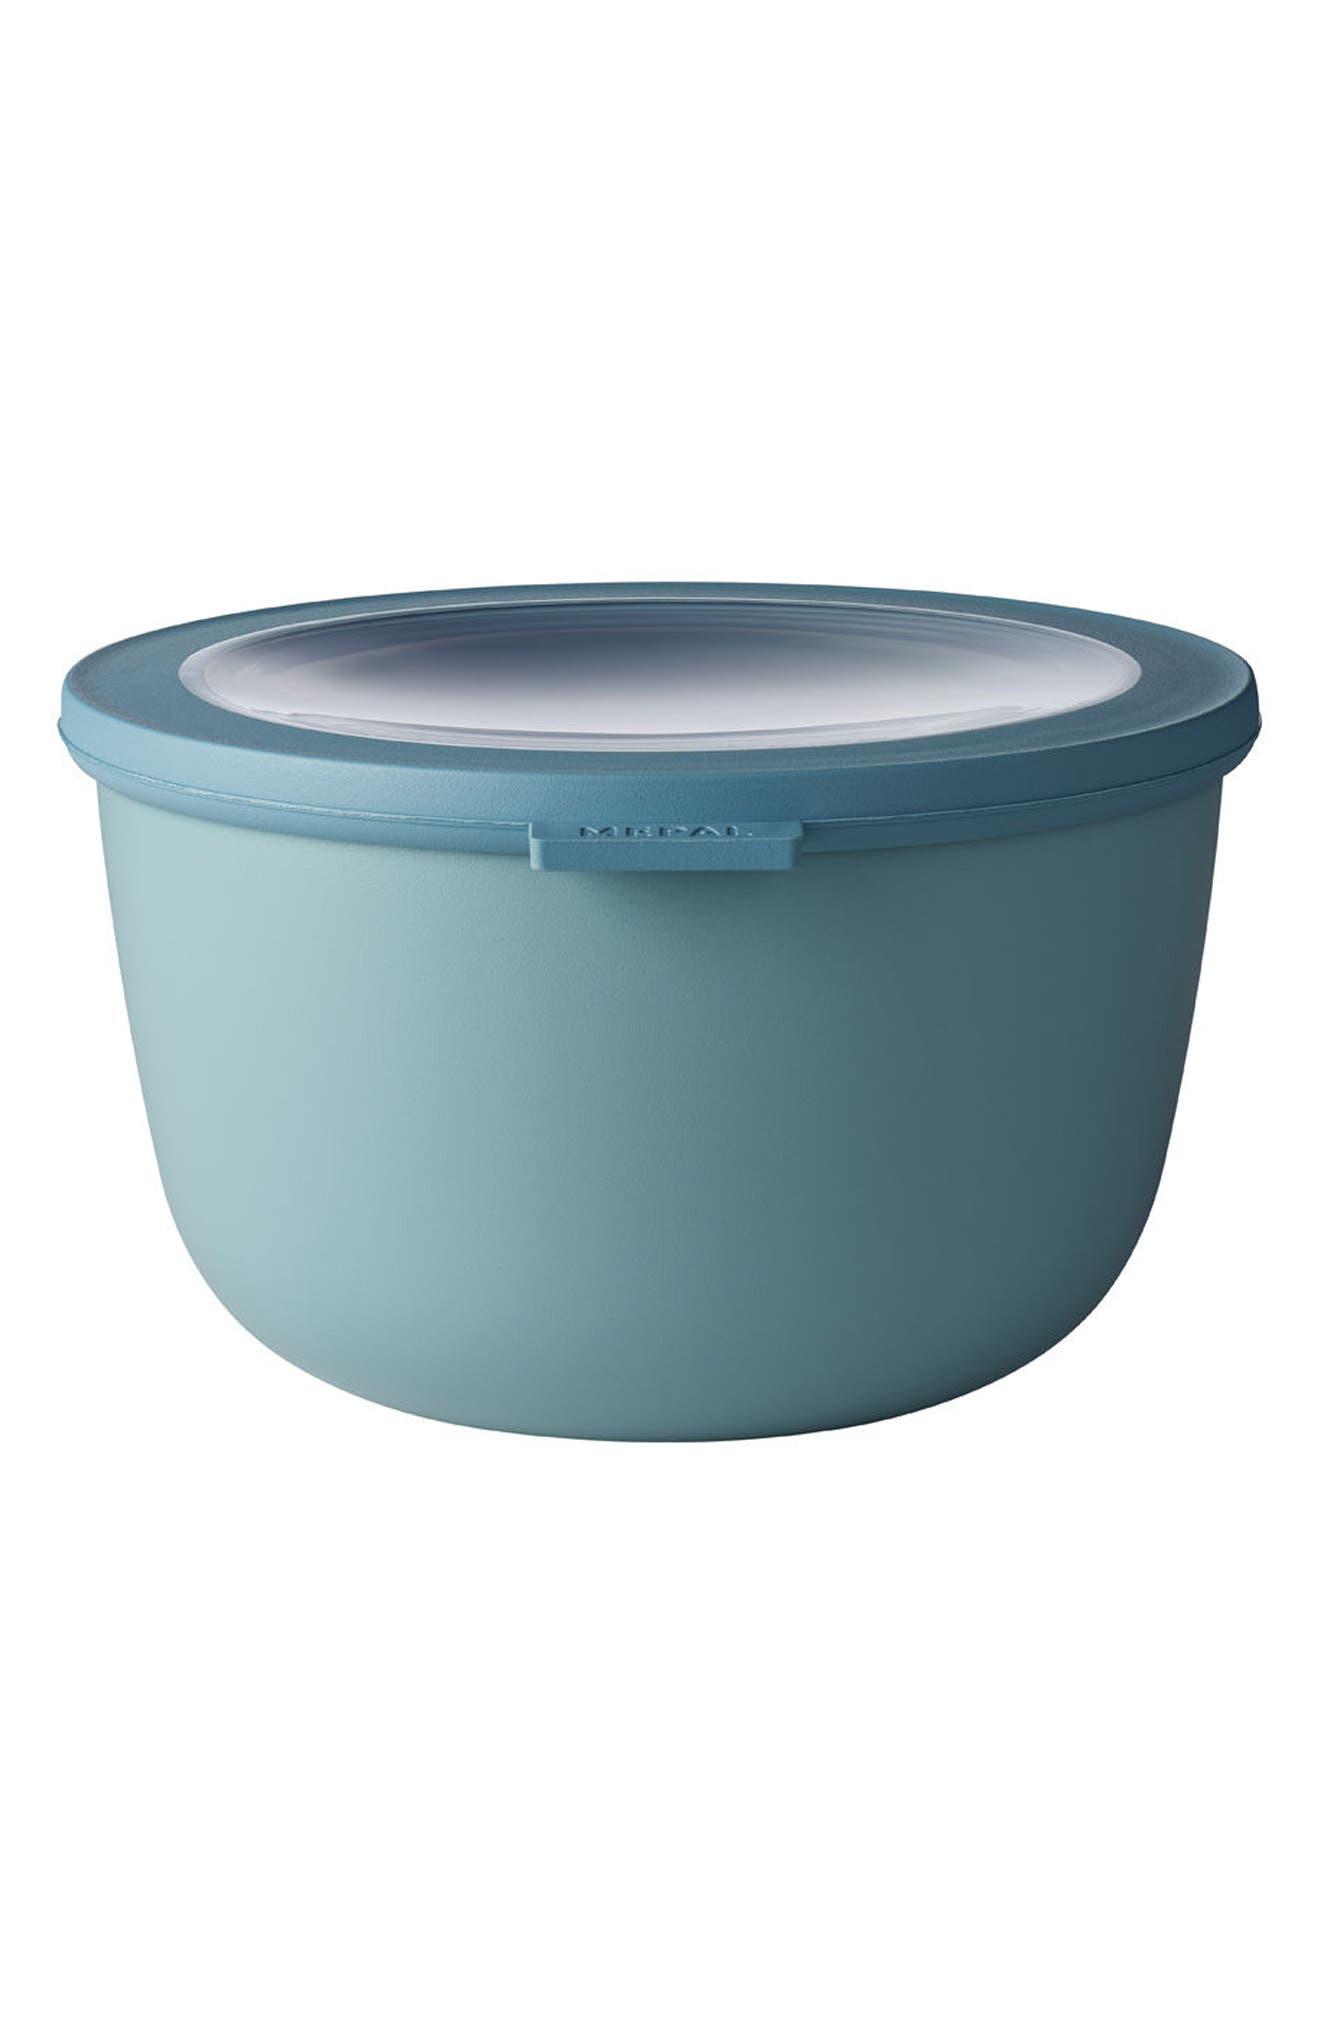 Cirqula Set of 4 Storage Bowls,                             Alternate thumbnail 5, color,                             Blue